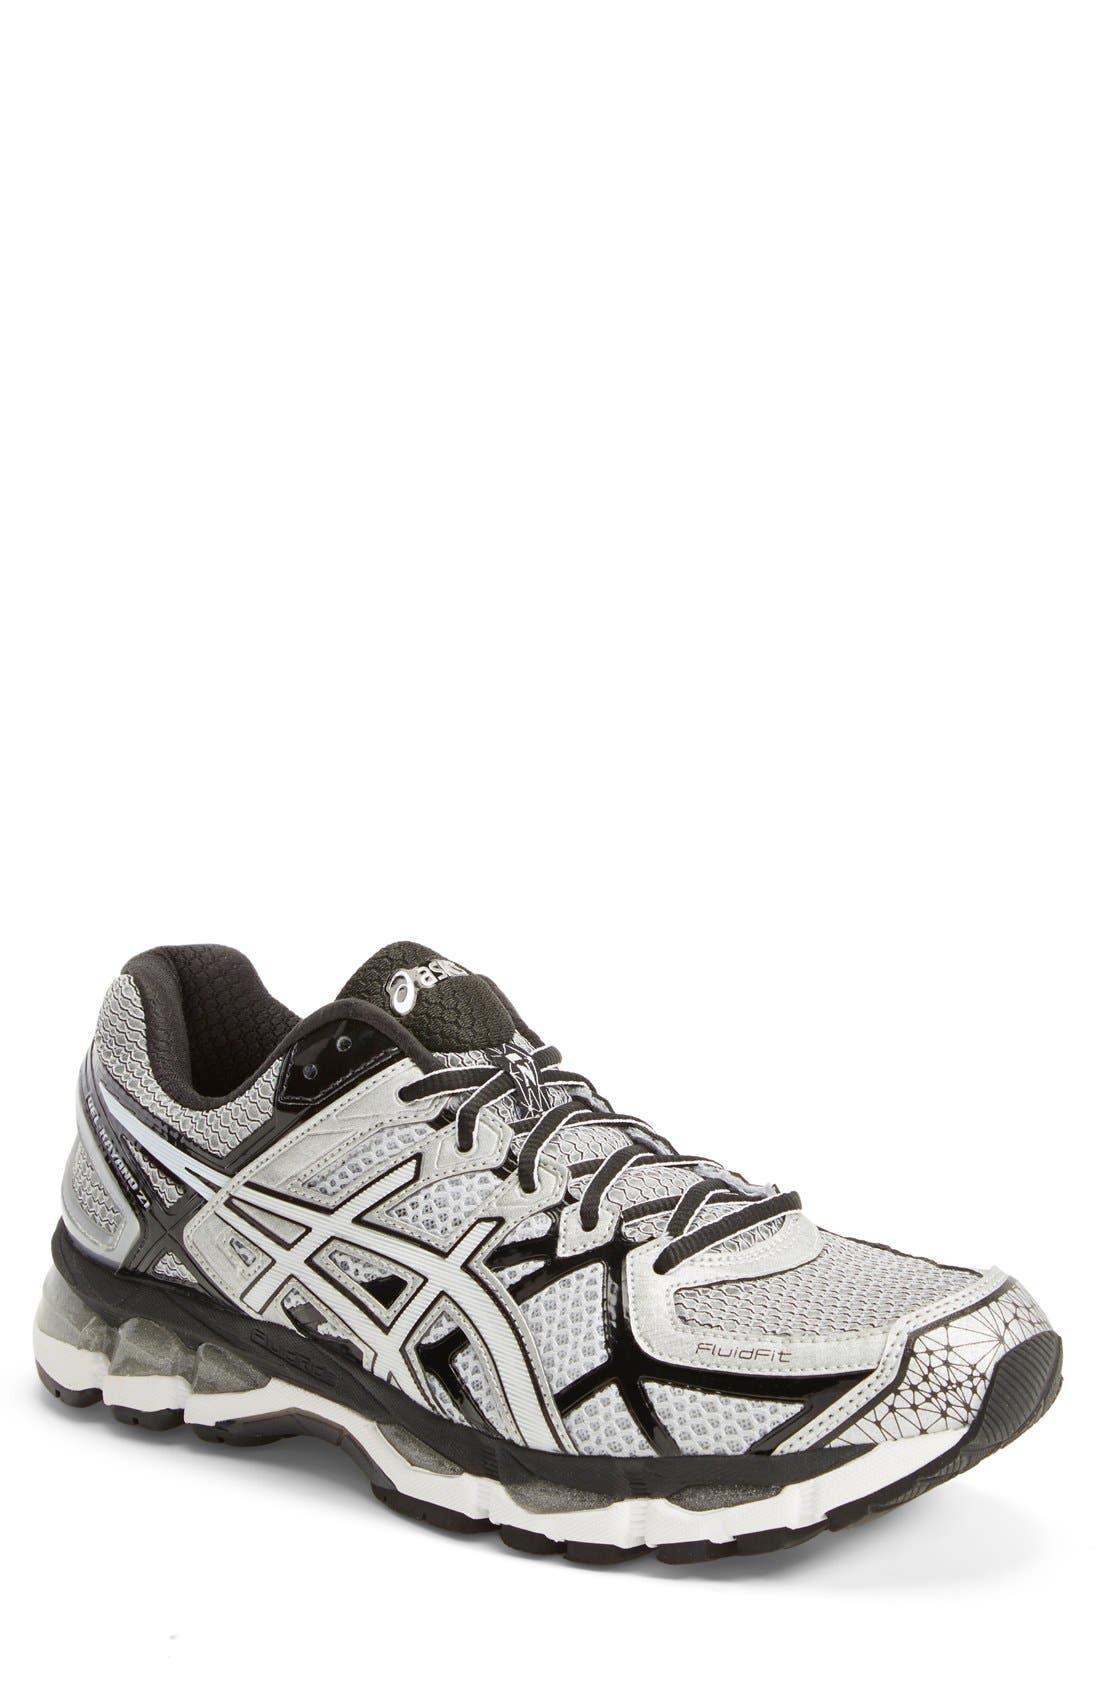 ASICS® Chaussure de (Homme) course GEL Kayano® seulement) 21 (Homme) (En ligne ligne seulement) | 210be92 - www.meganking.website